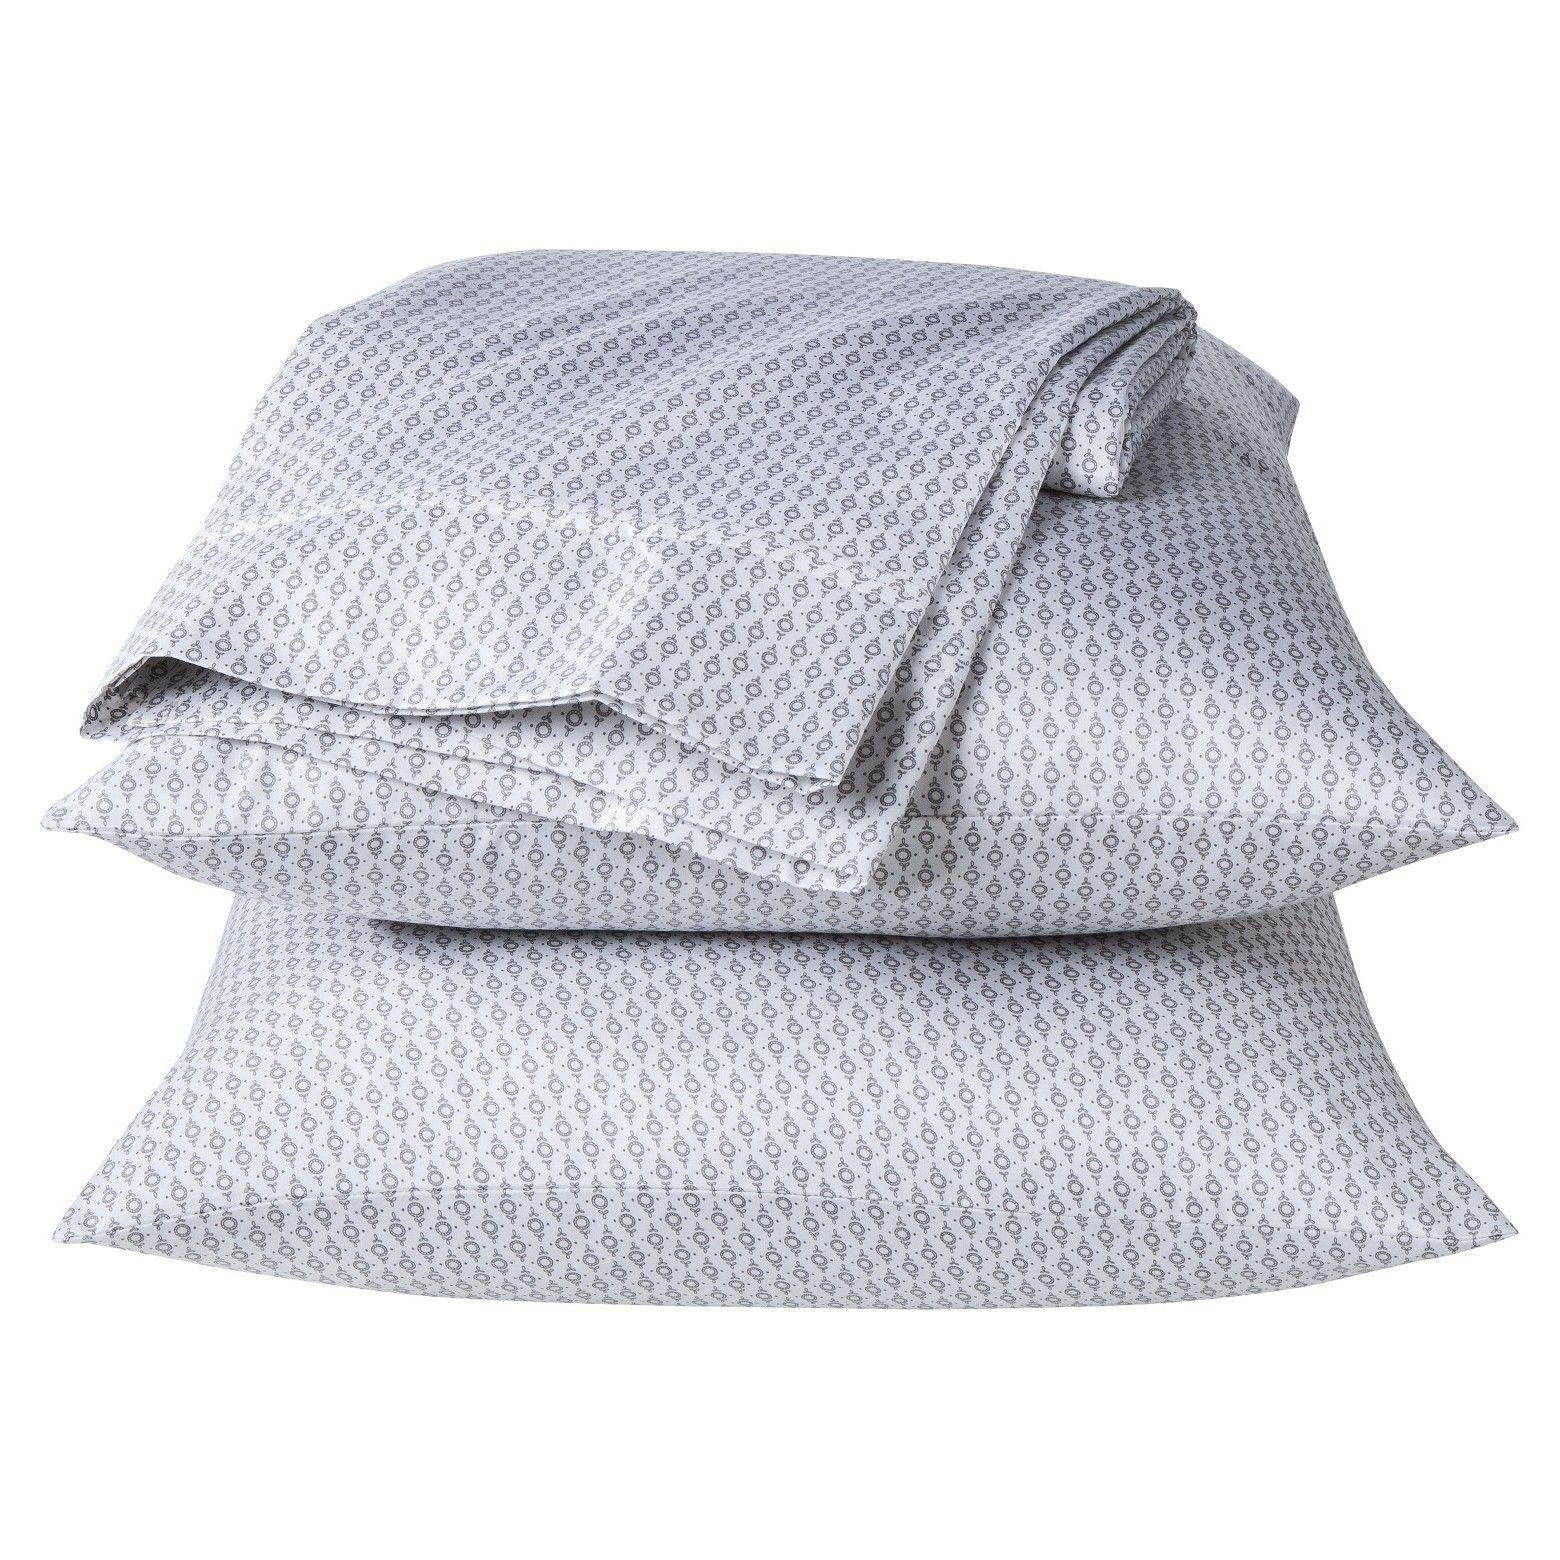 Threshold performance sheet set patterns thread count bedding